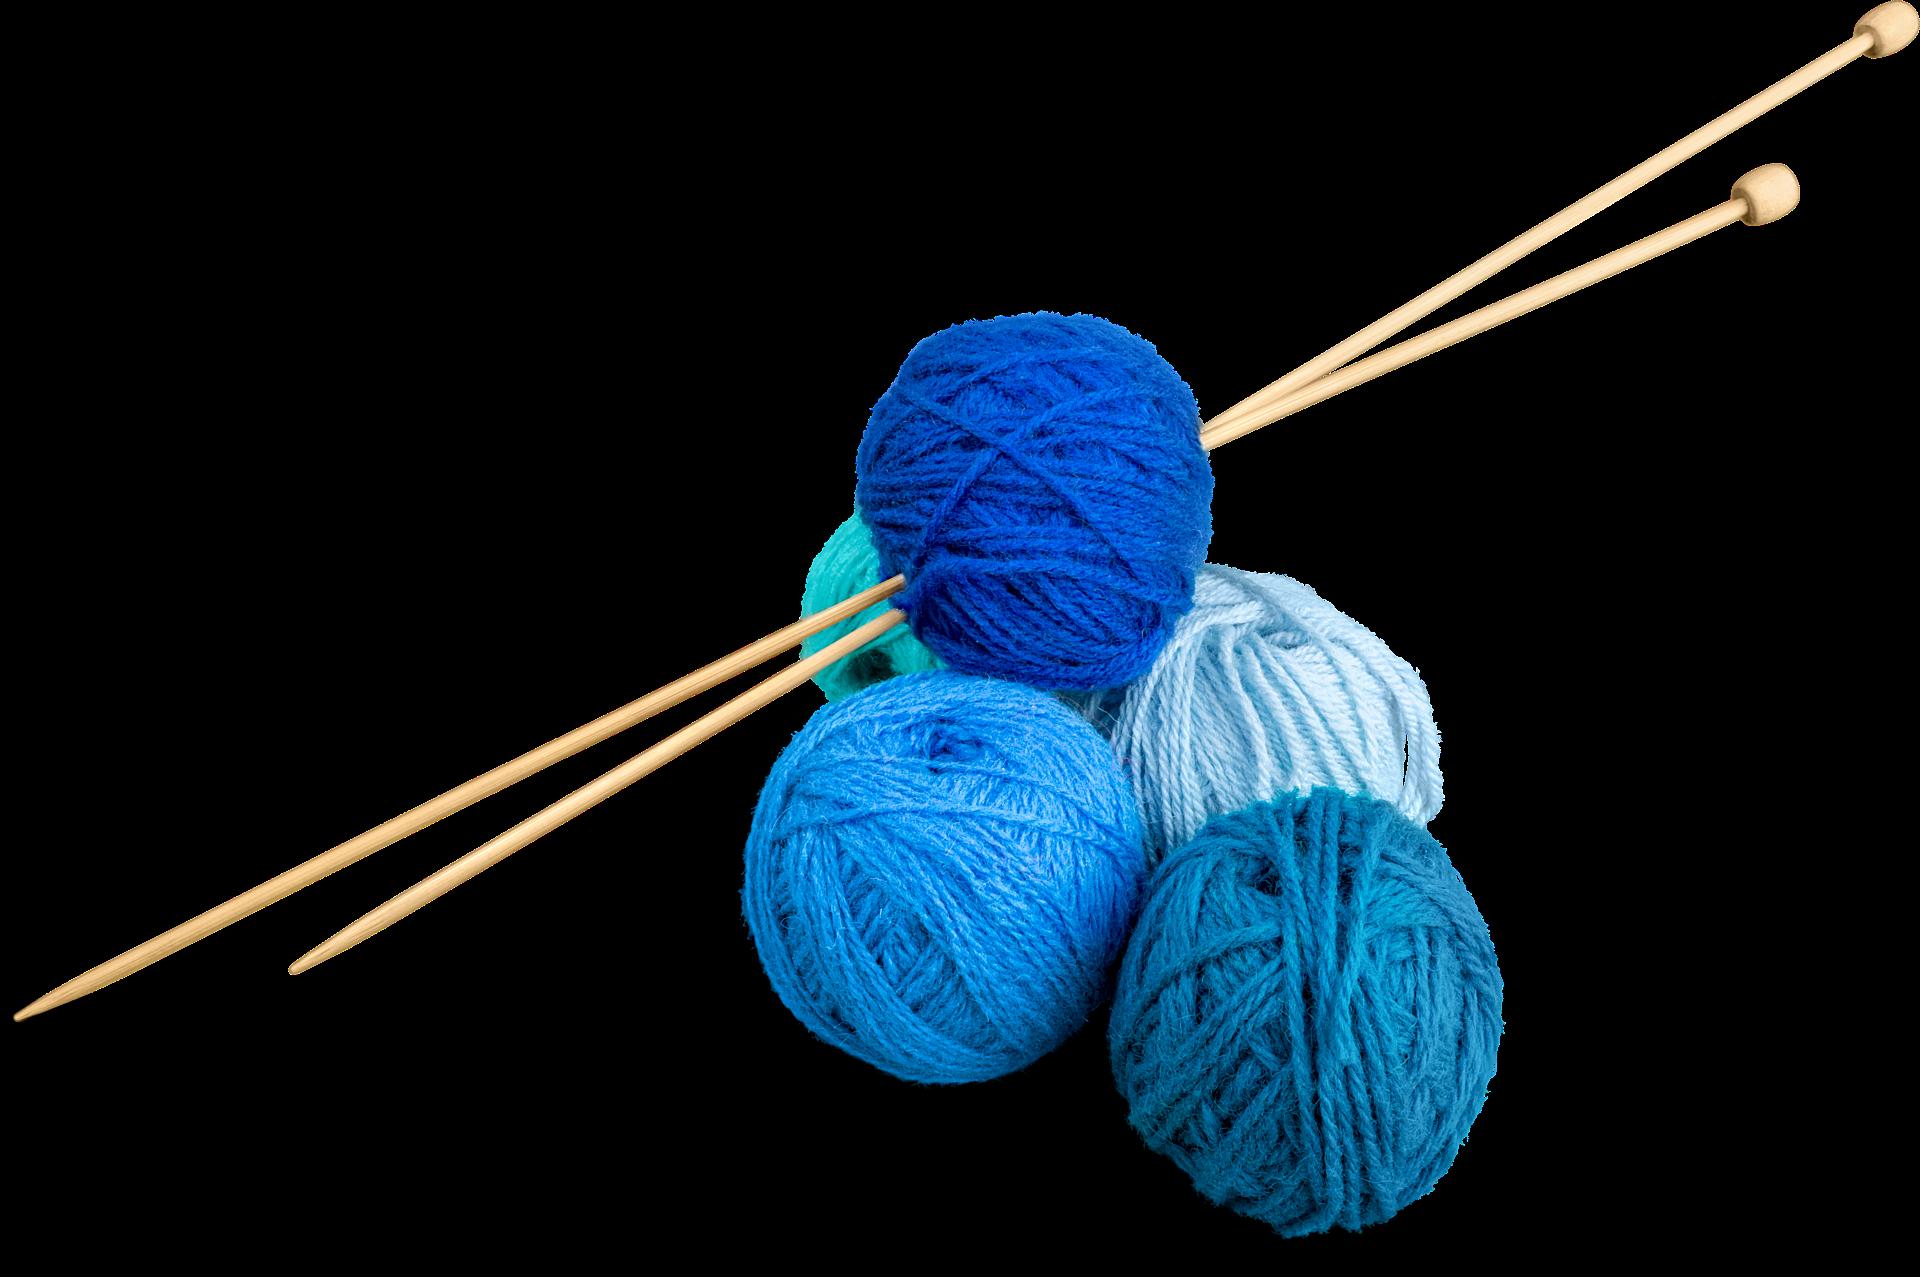 Knitting clipart knitting club. Ebiznes zadarmo info make